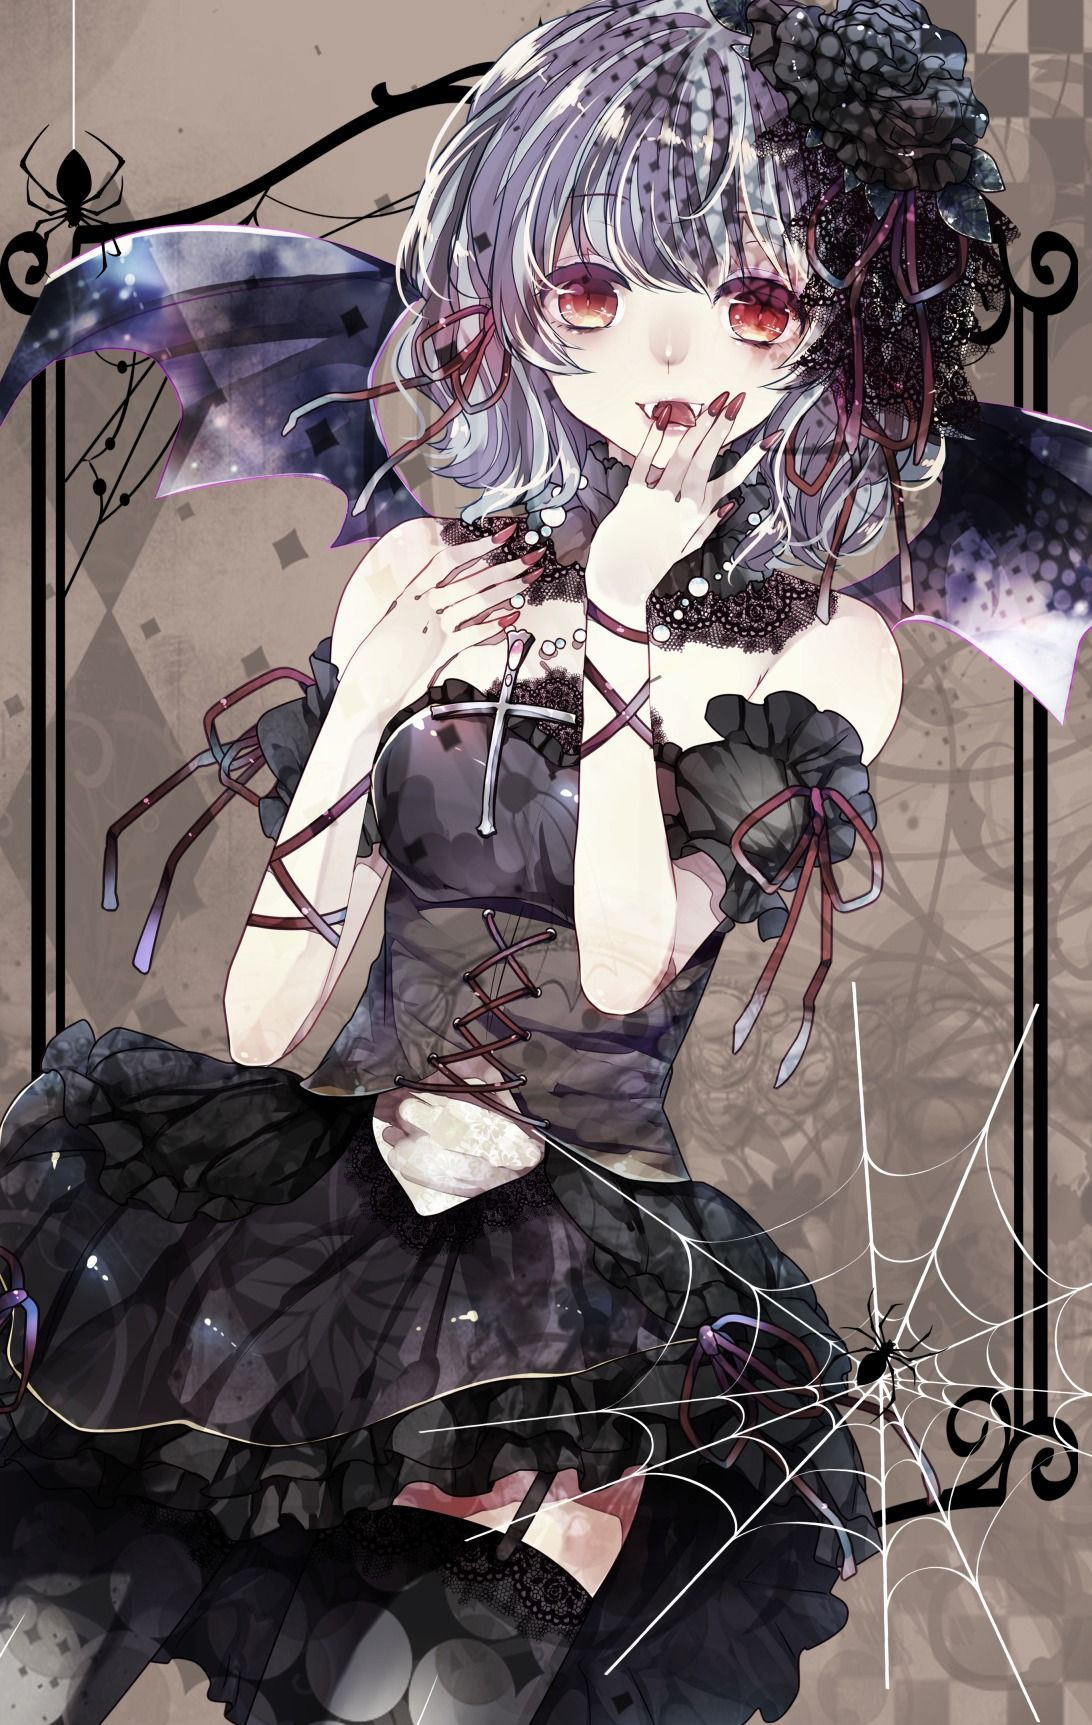 anime Anime, Gothic anime, Anime artwork